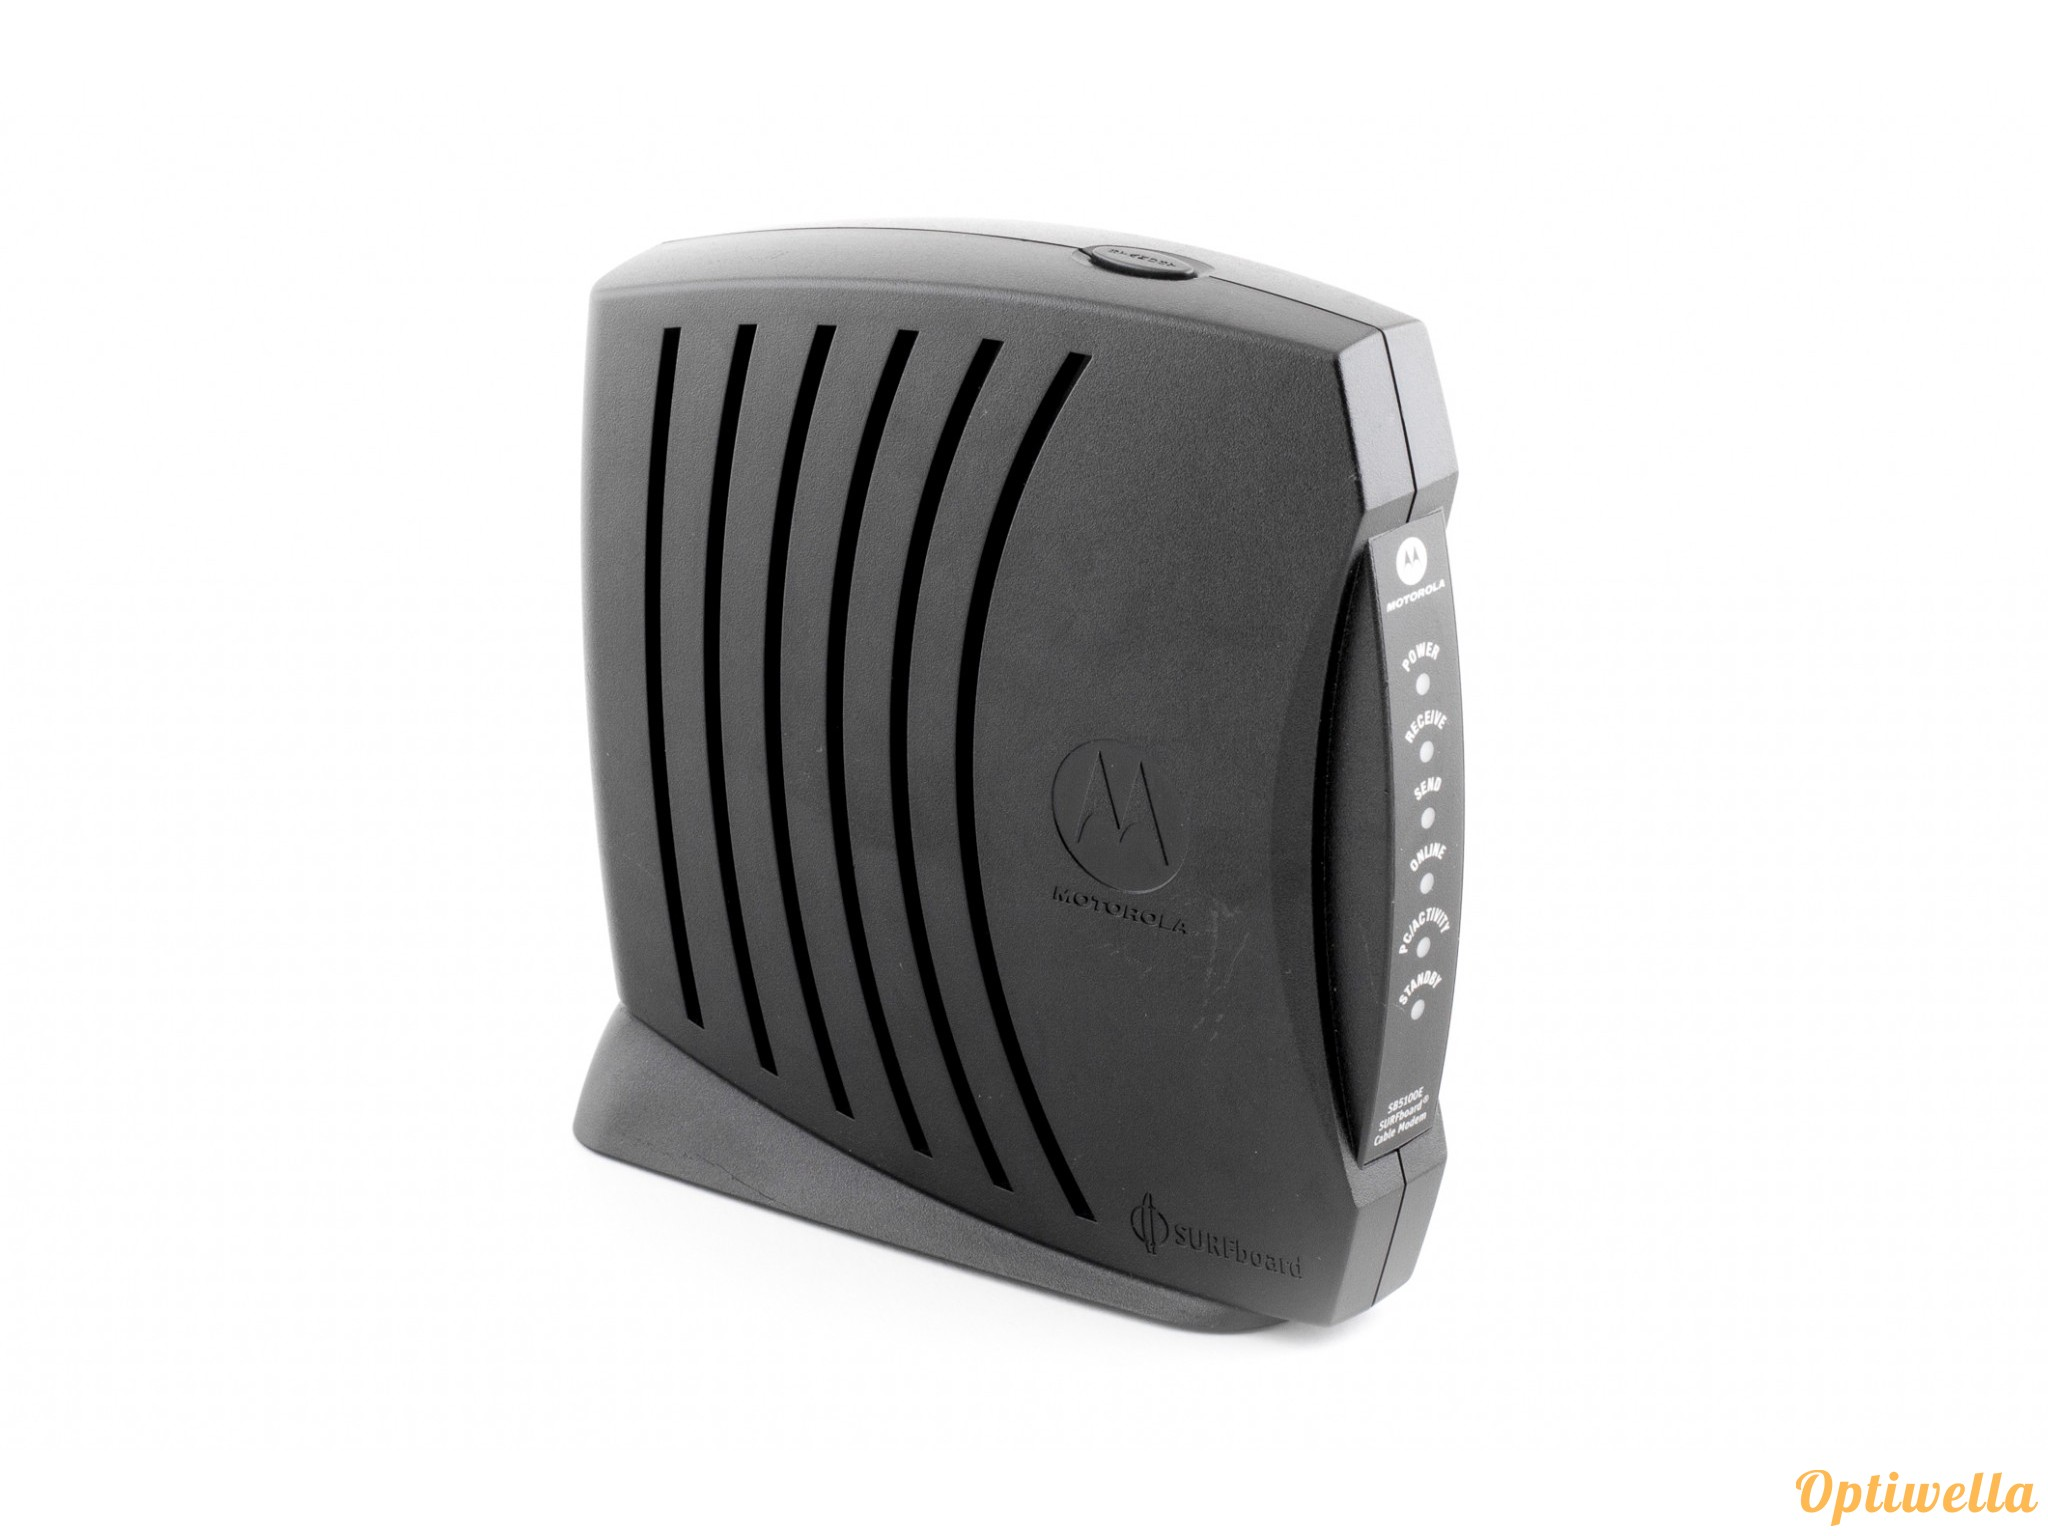 Motorola Surfboard 174 Sb5100 Cable Modem Modem